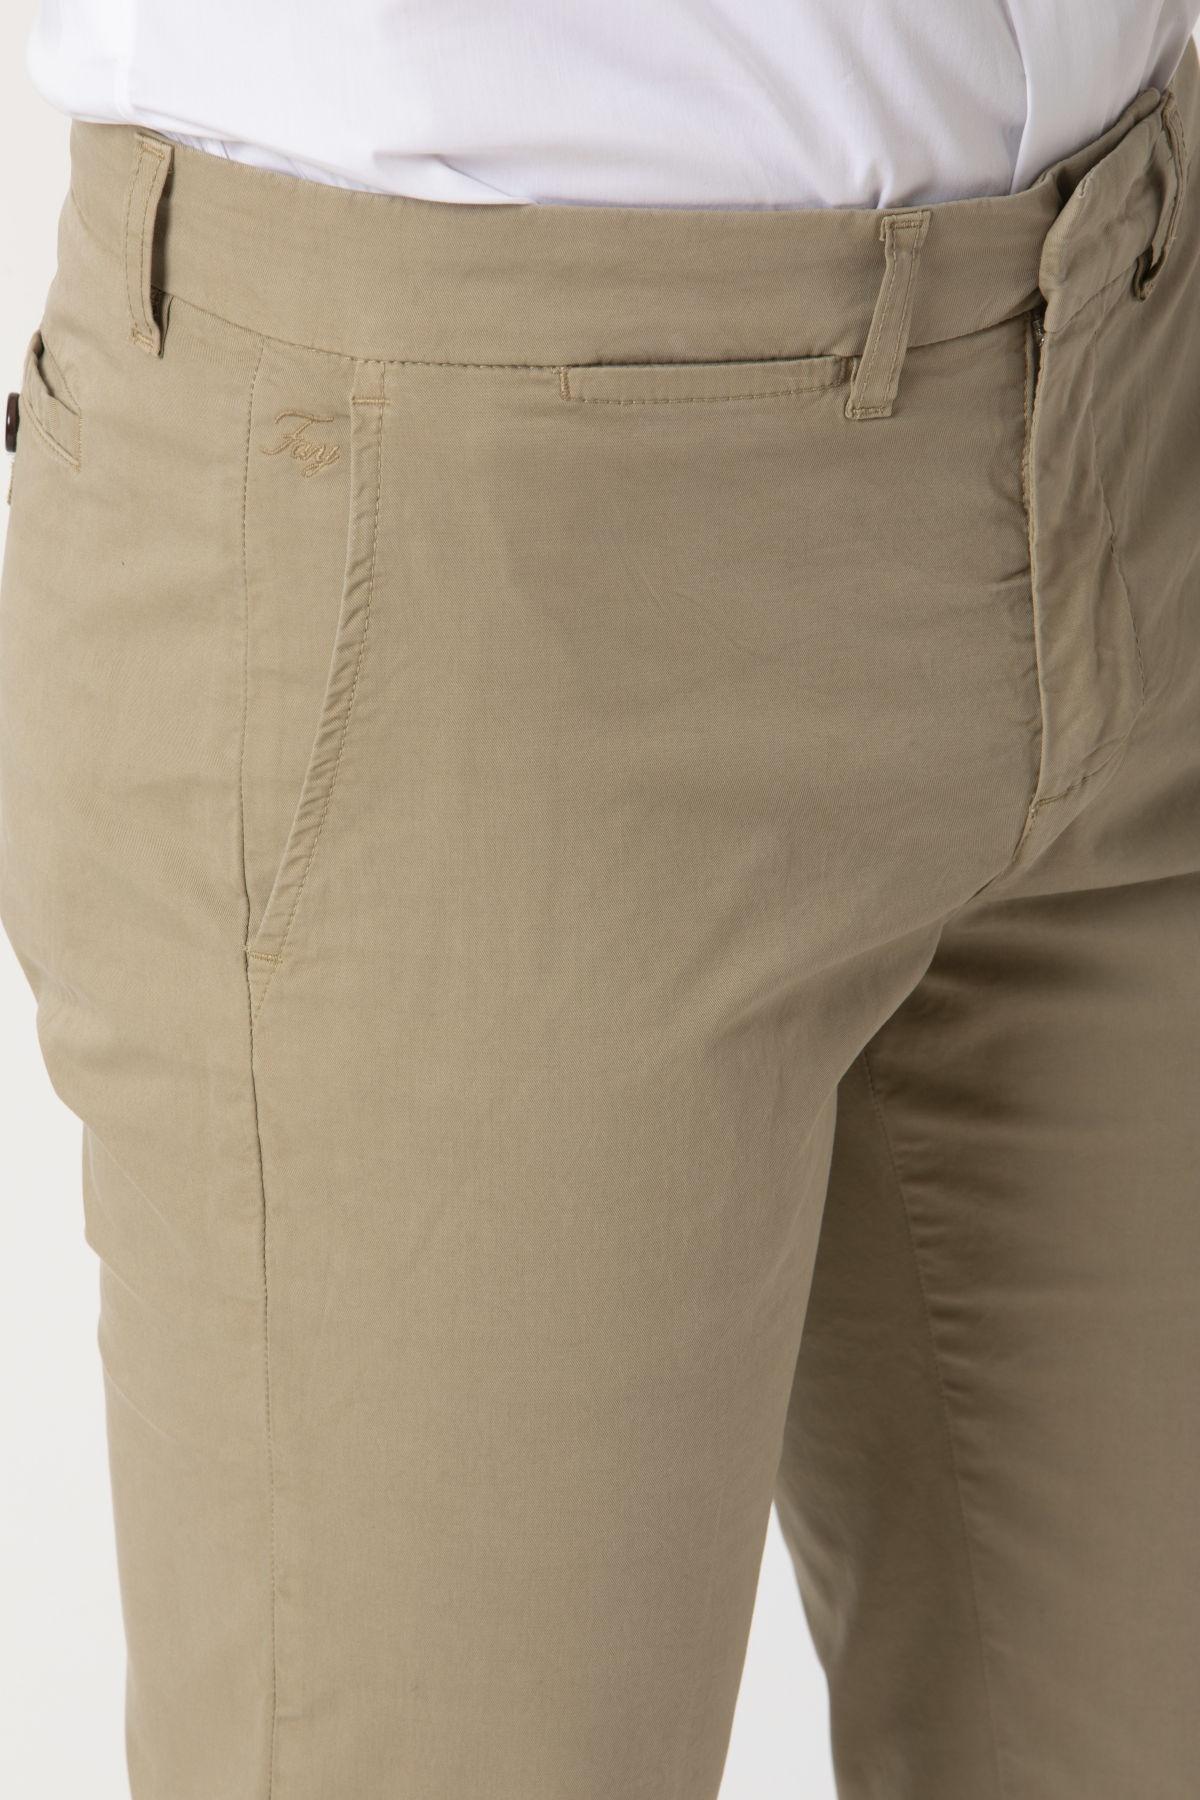 buy online 69307 59975 Pantaloni per uomo FAY P/E 19 - Rione Fontana